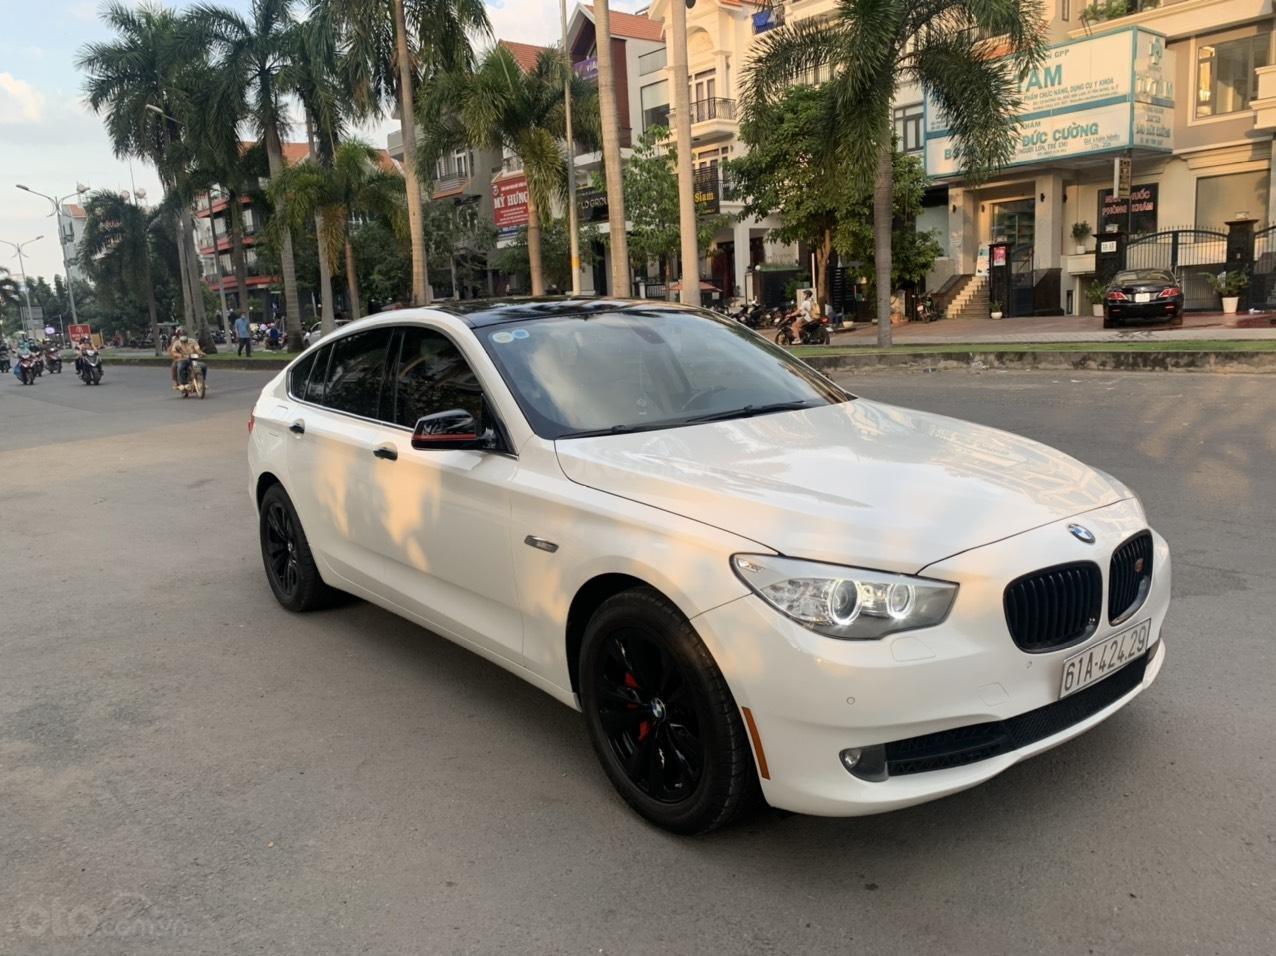 Cần bán gấp BMW 535GT SX 2011, giá 960 triệu (1)